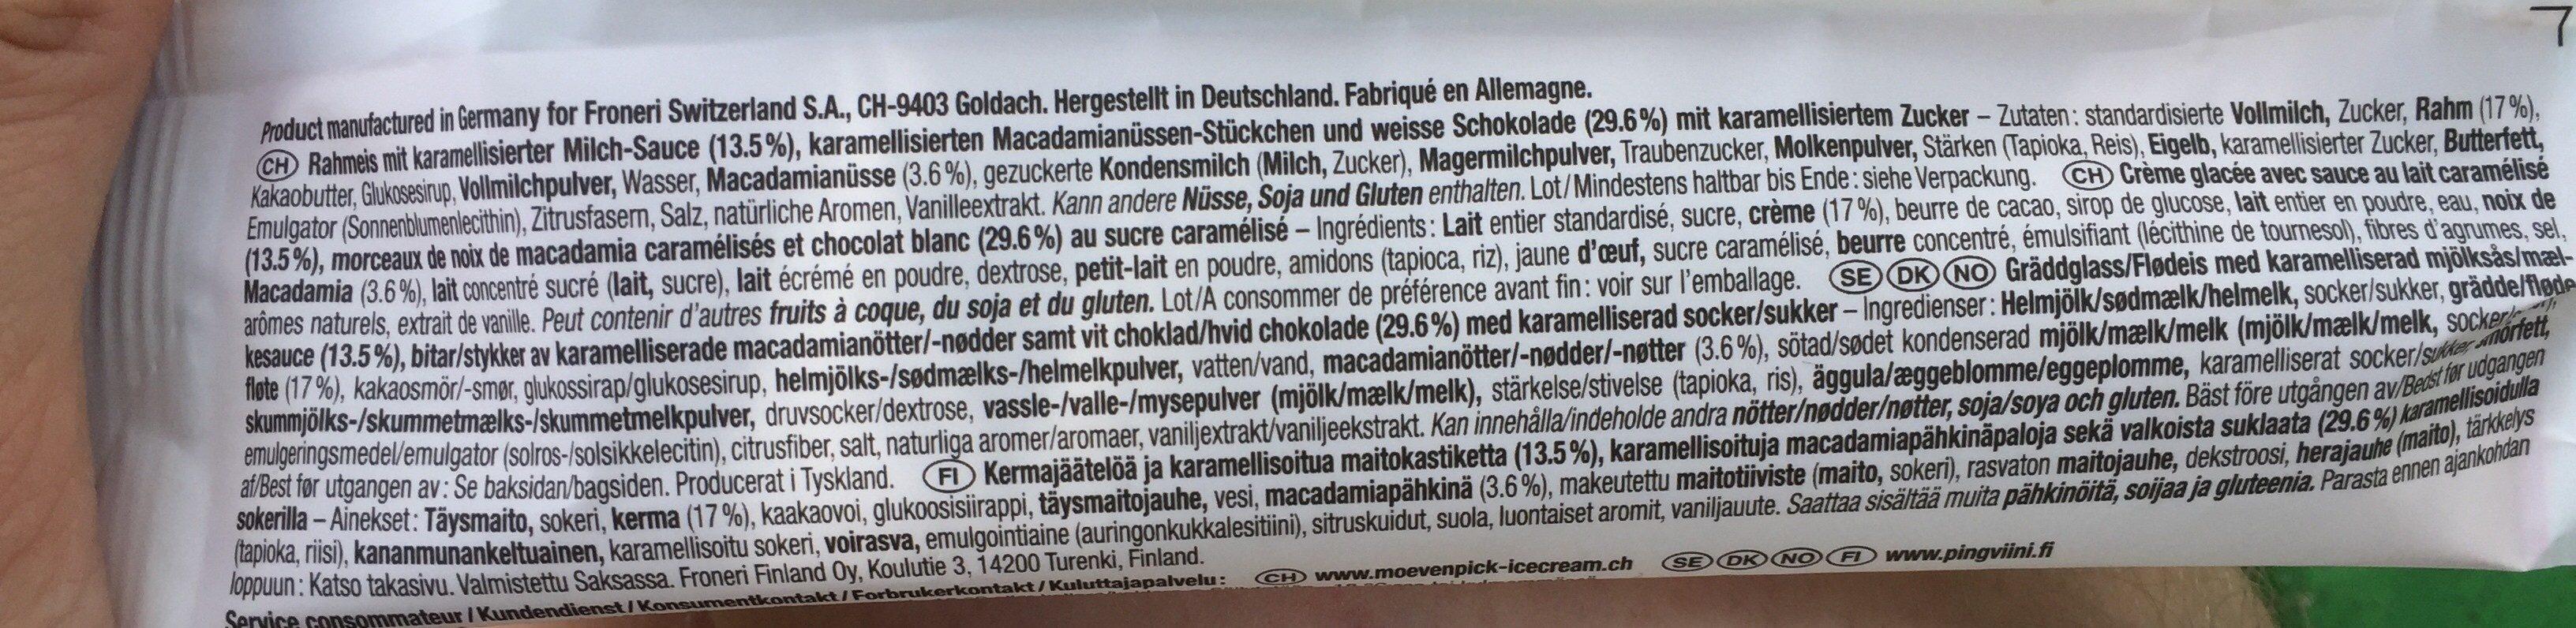 Mövenpick macadamia - Ingredients